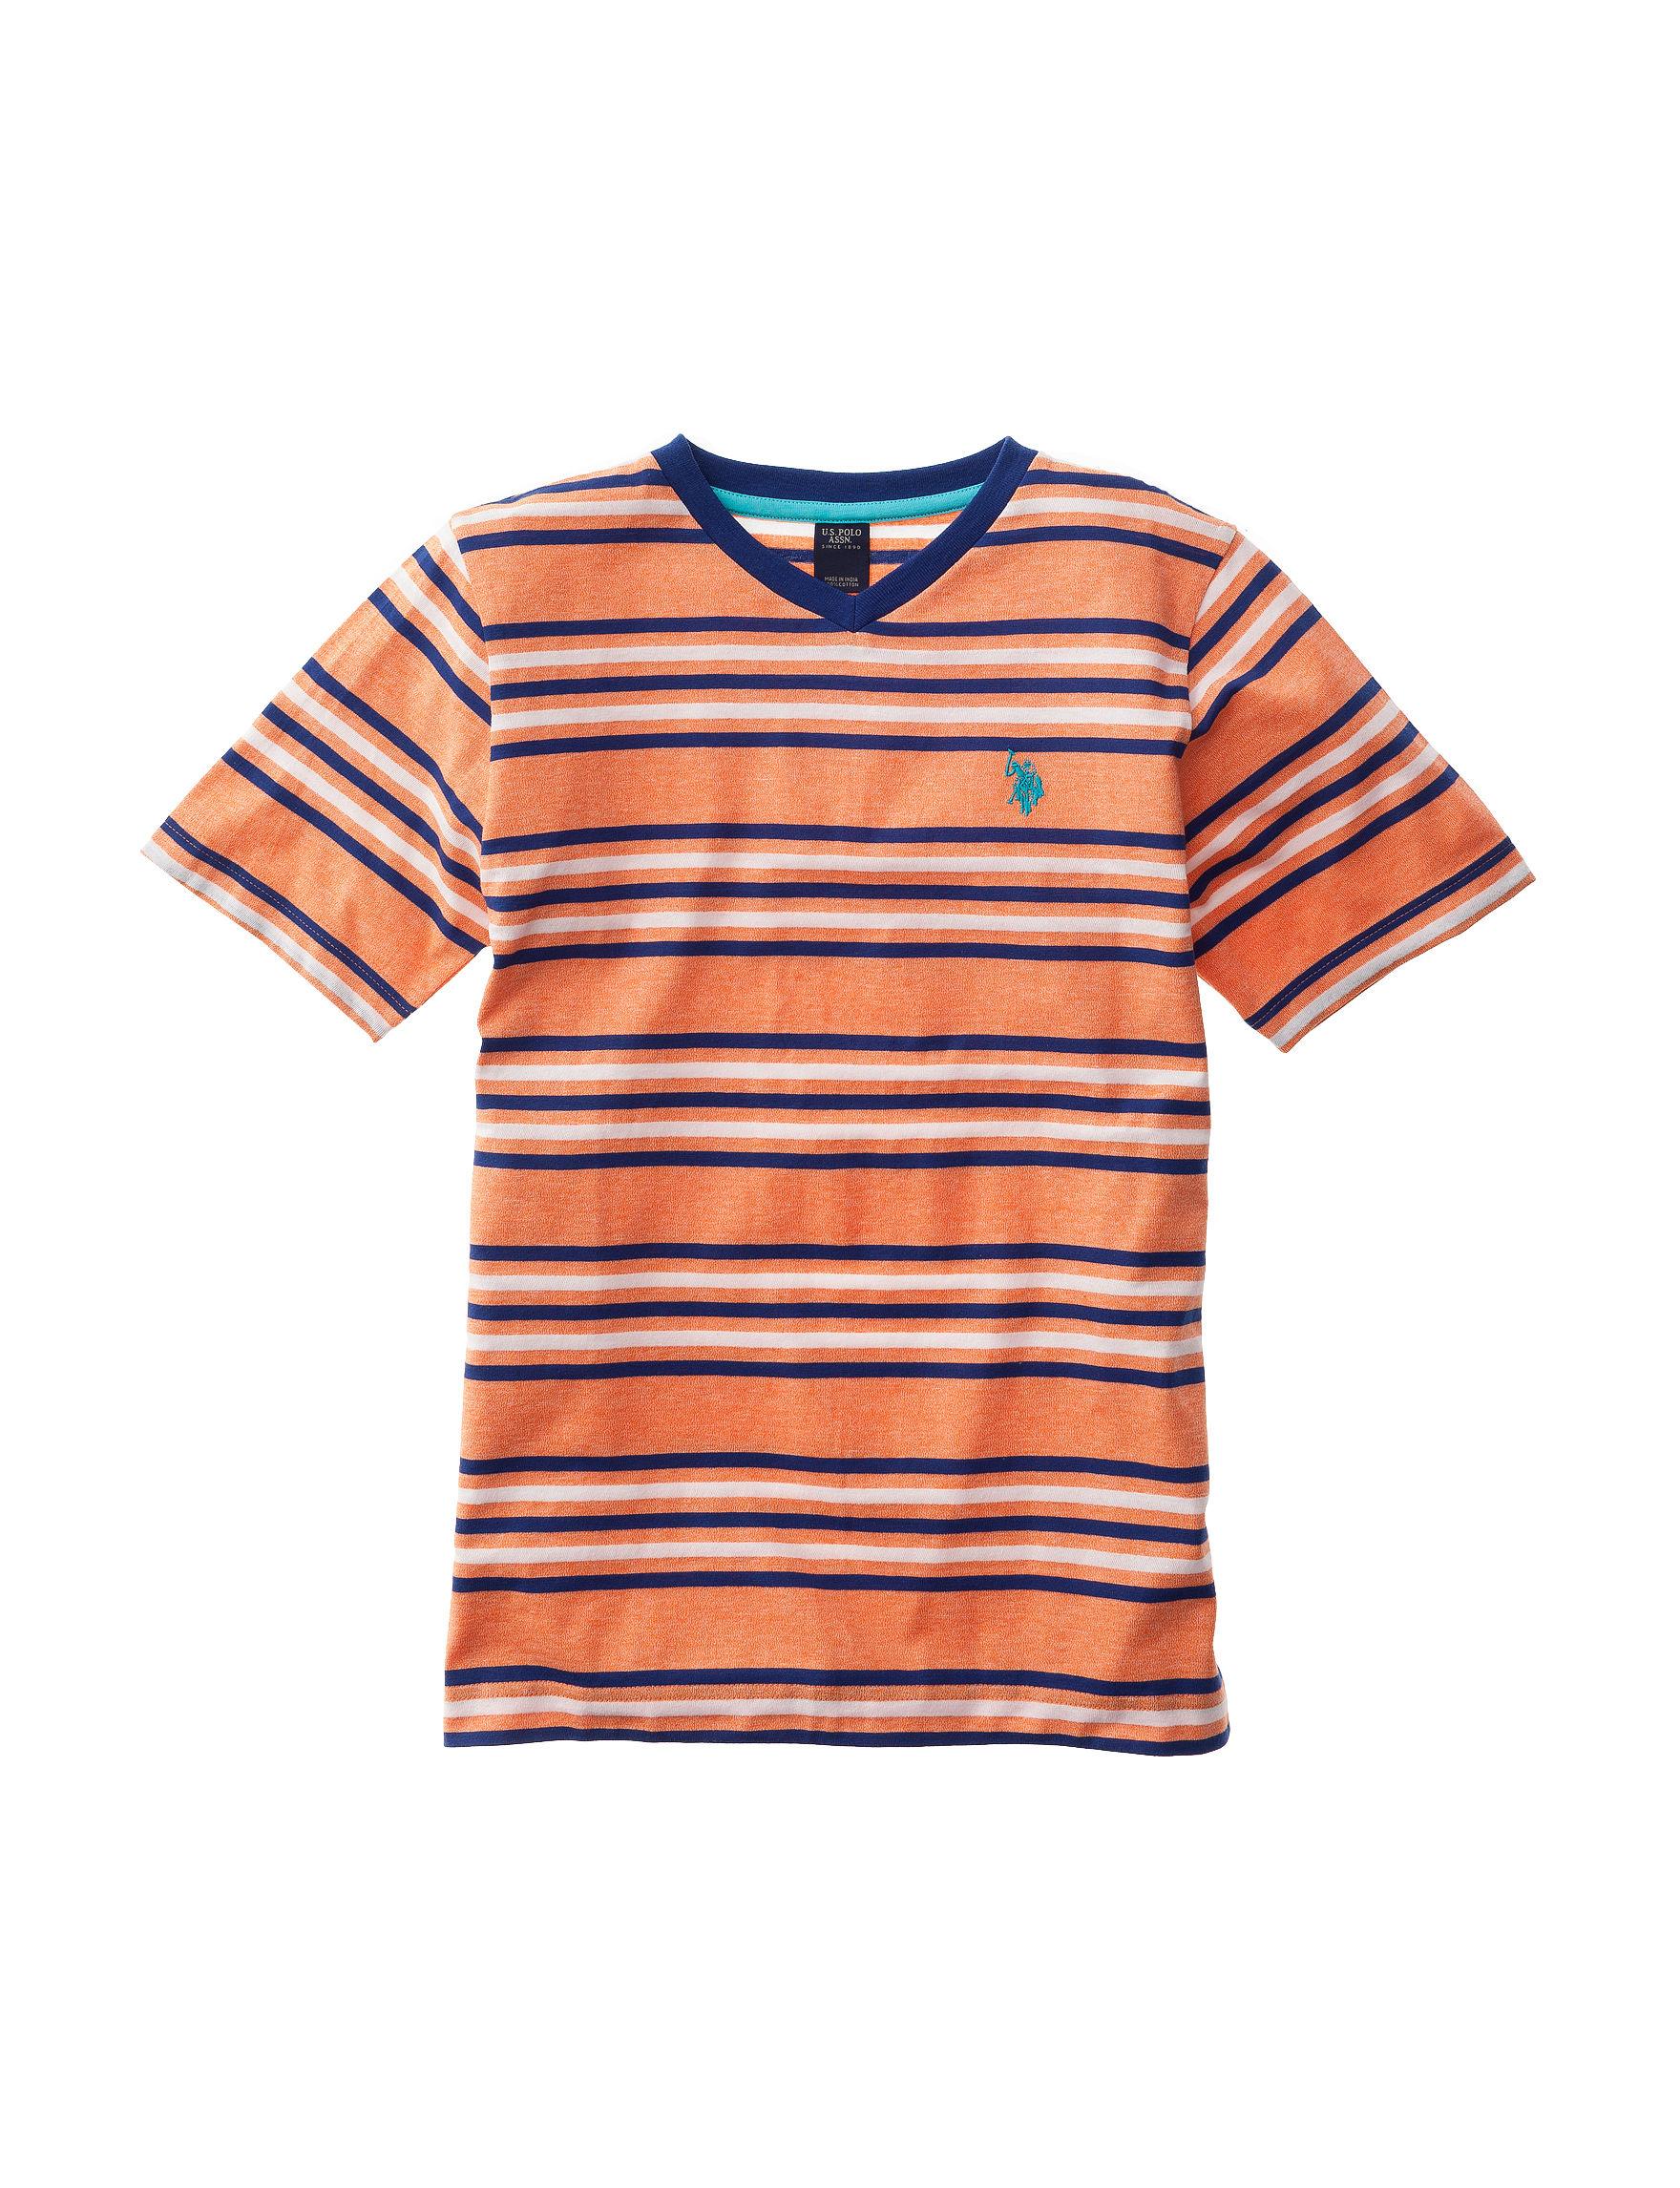 U.S. Polo Assn. Bright Orange Tees & Tanks